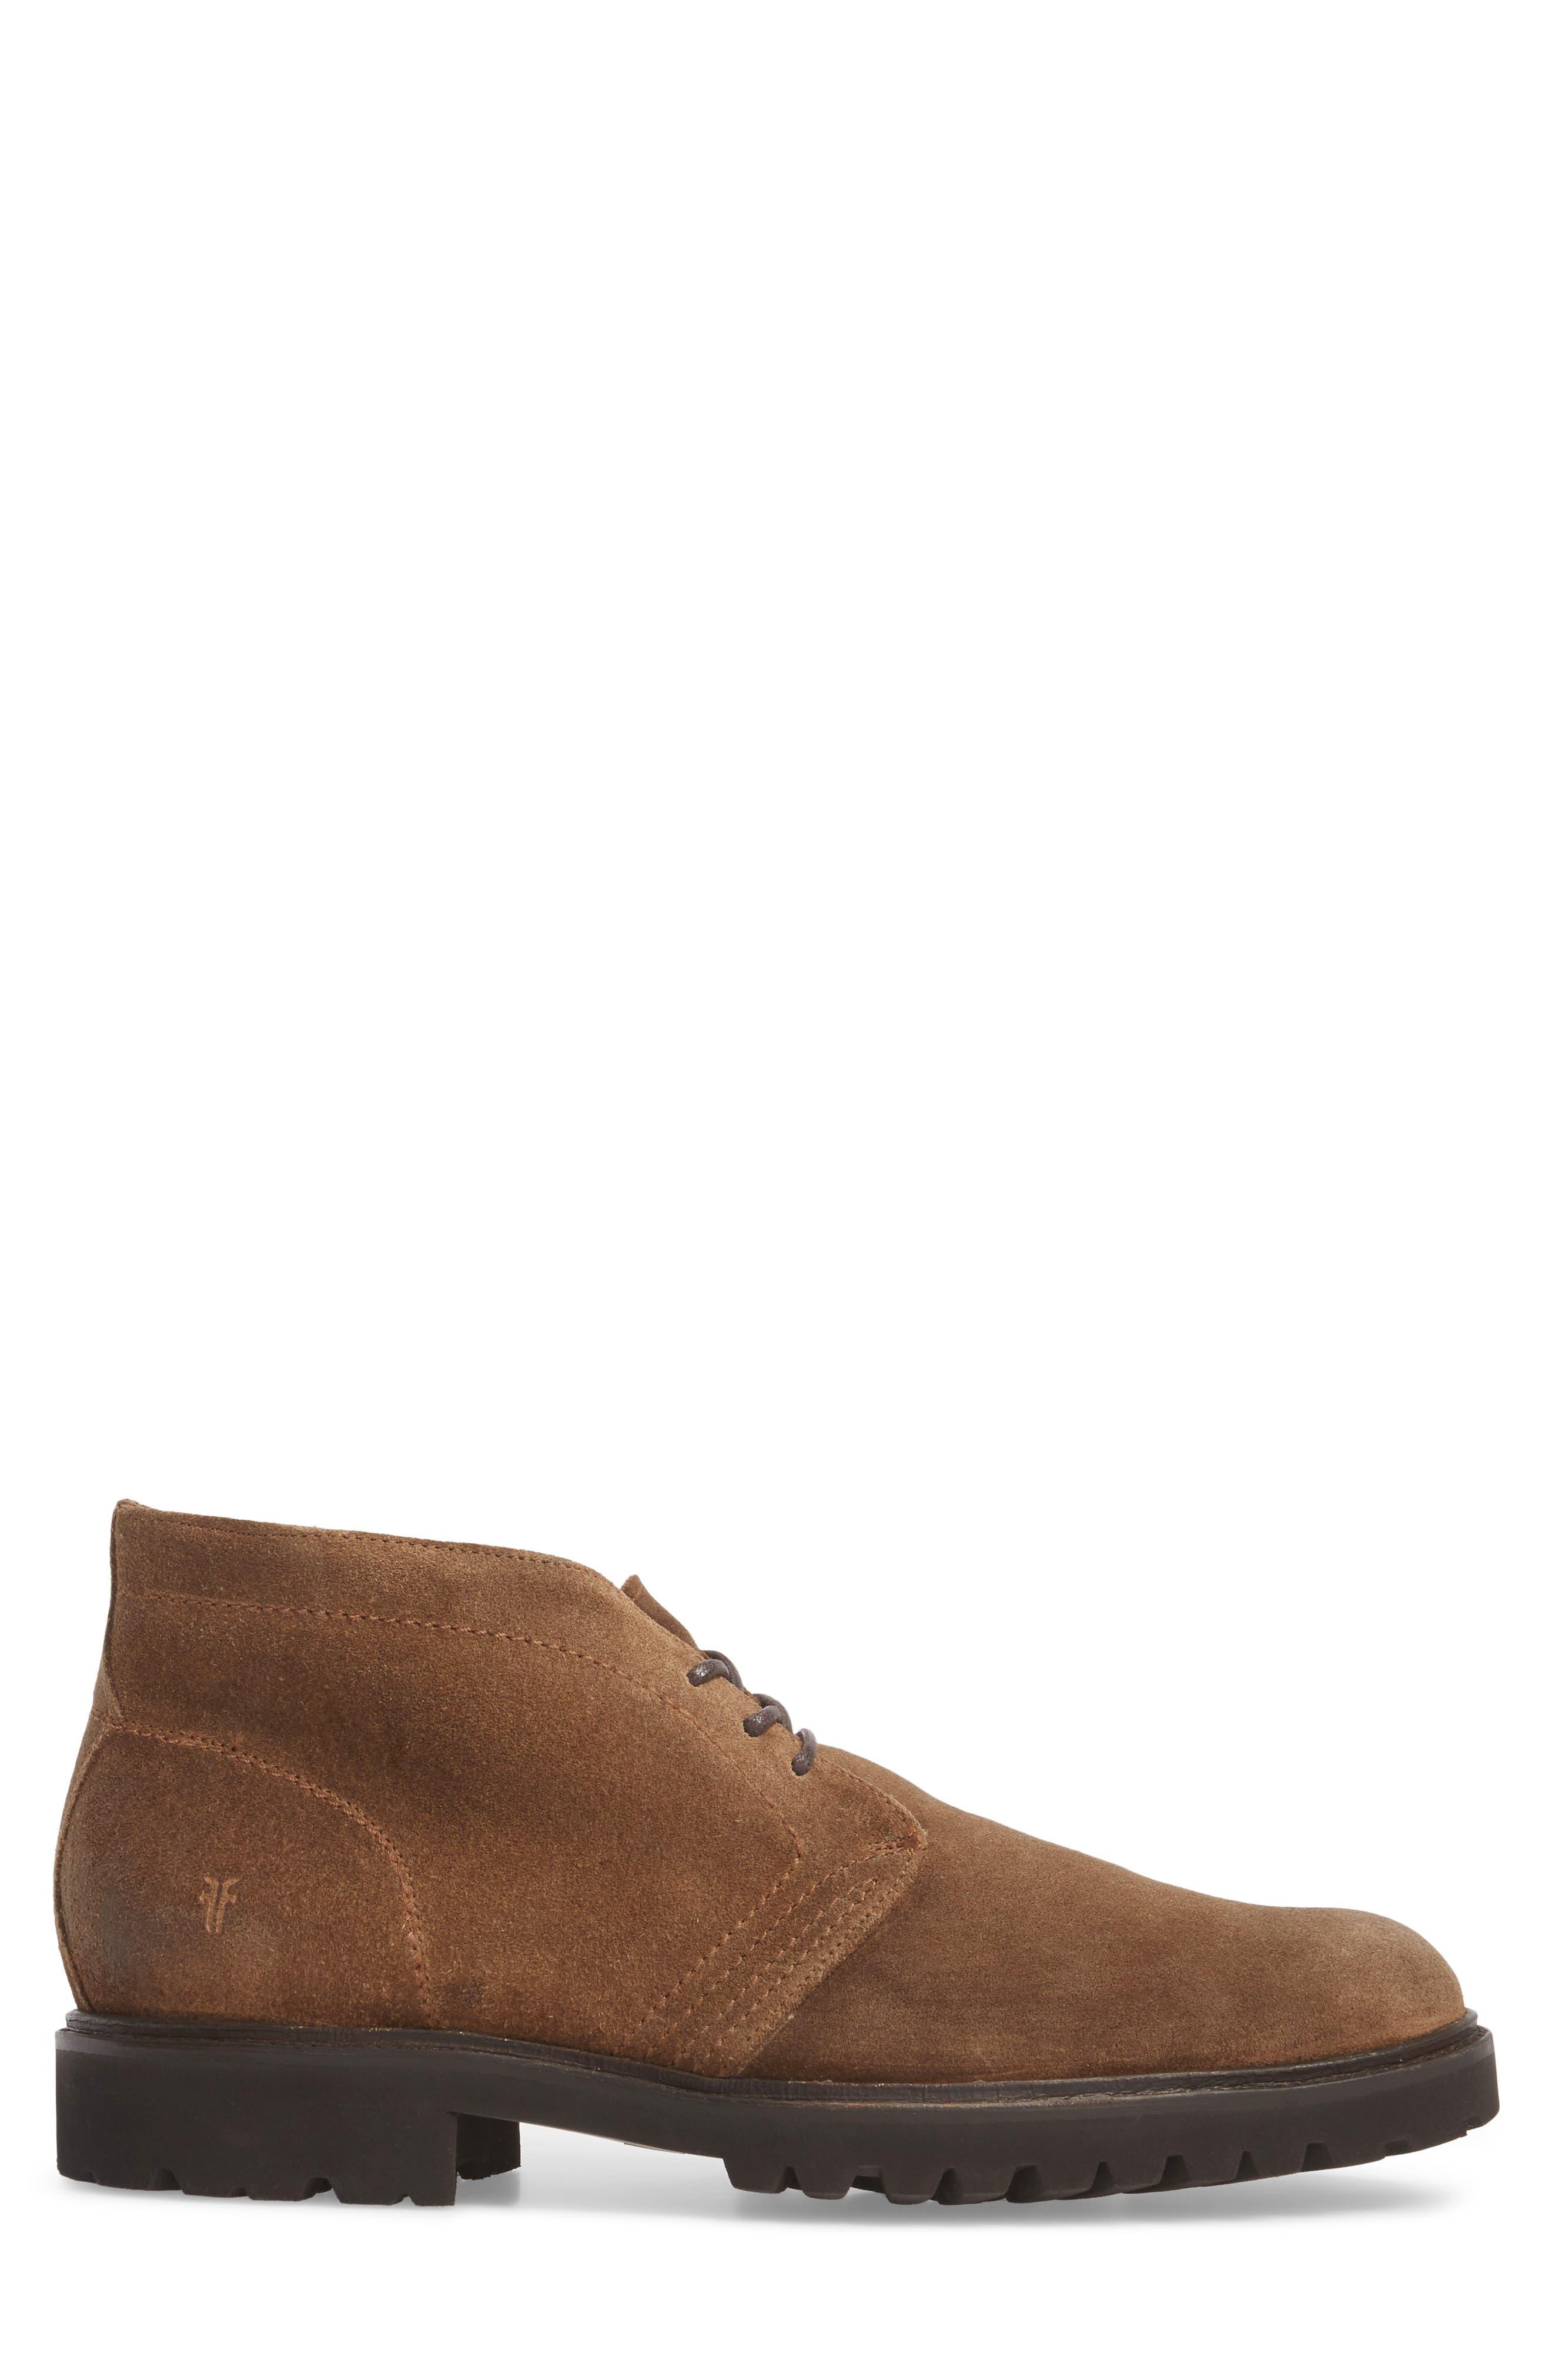 Edwin Waterproof Chukka Boot,                             Alternate thumbnail 3, color,                             Fawn Leather